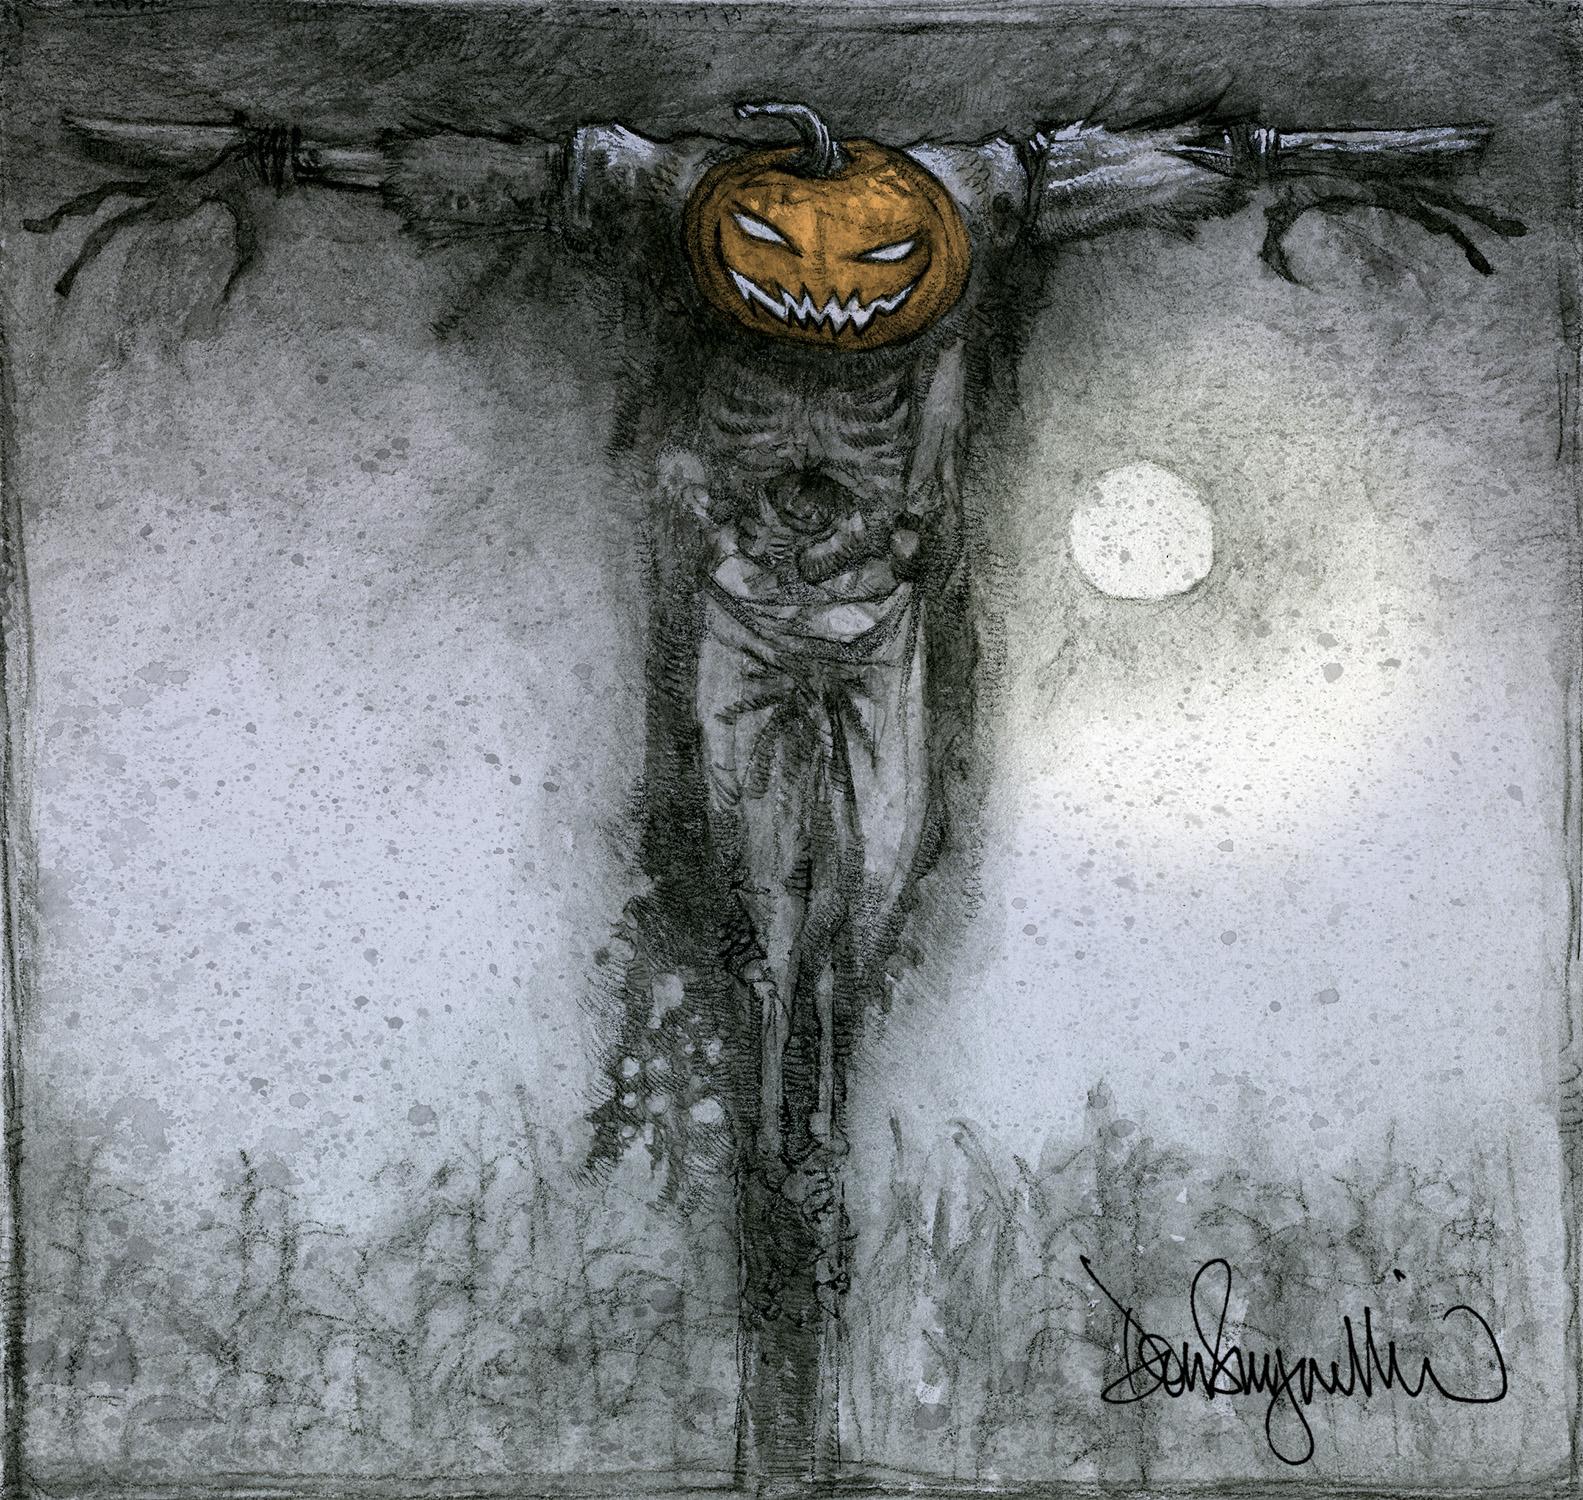 Seegmiller Art: October 2012